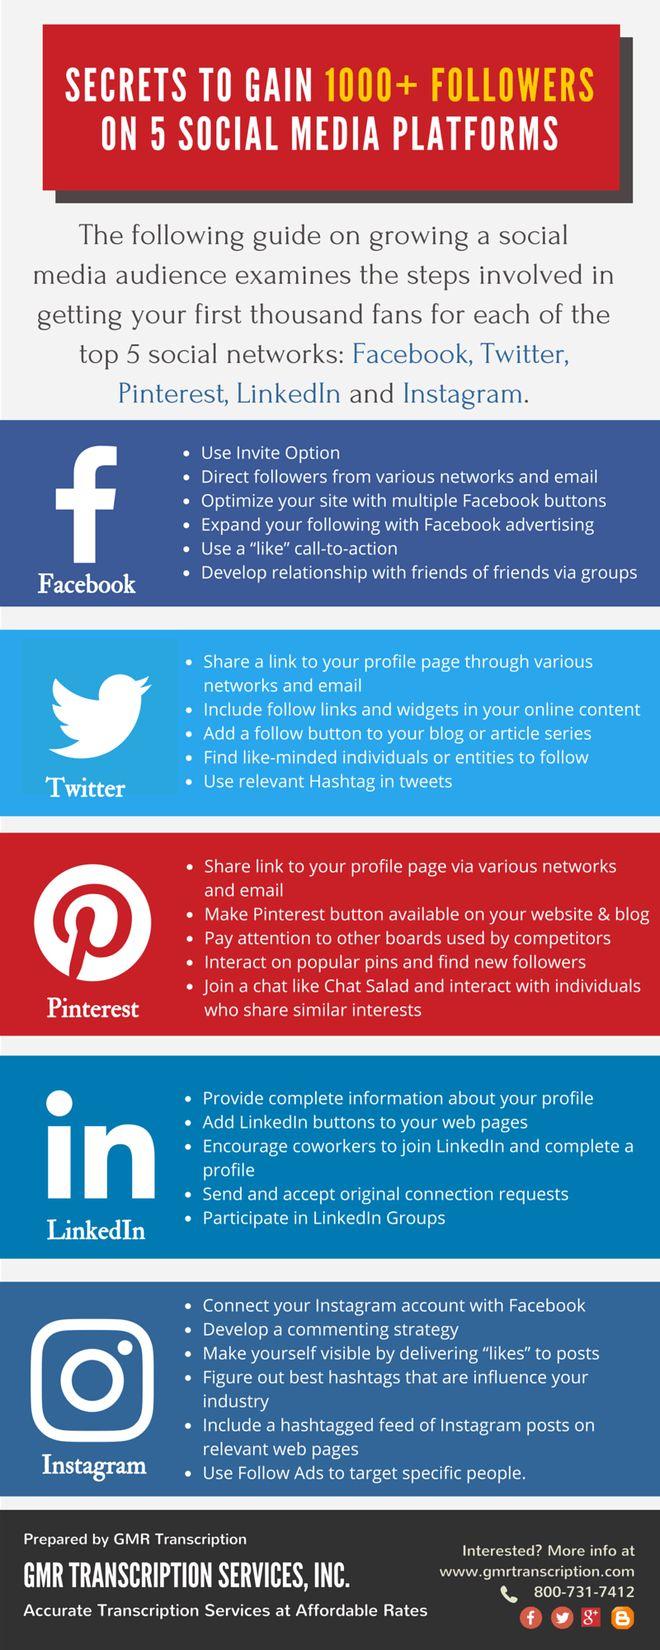 Secrets to Gain 1000+ Followers on Five Social Media Platforms